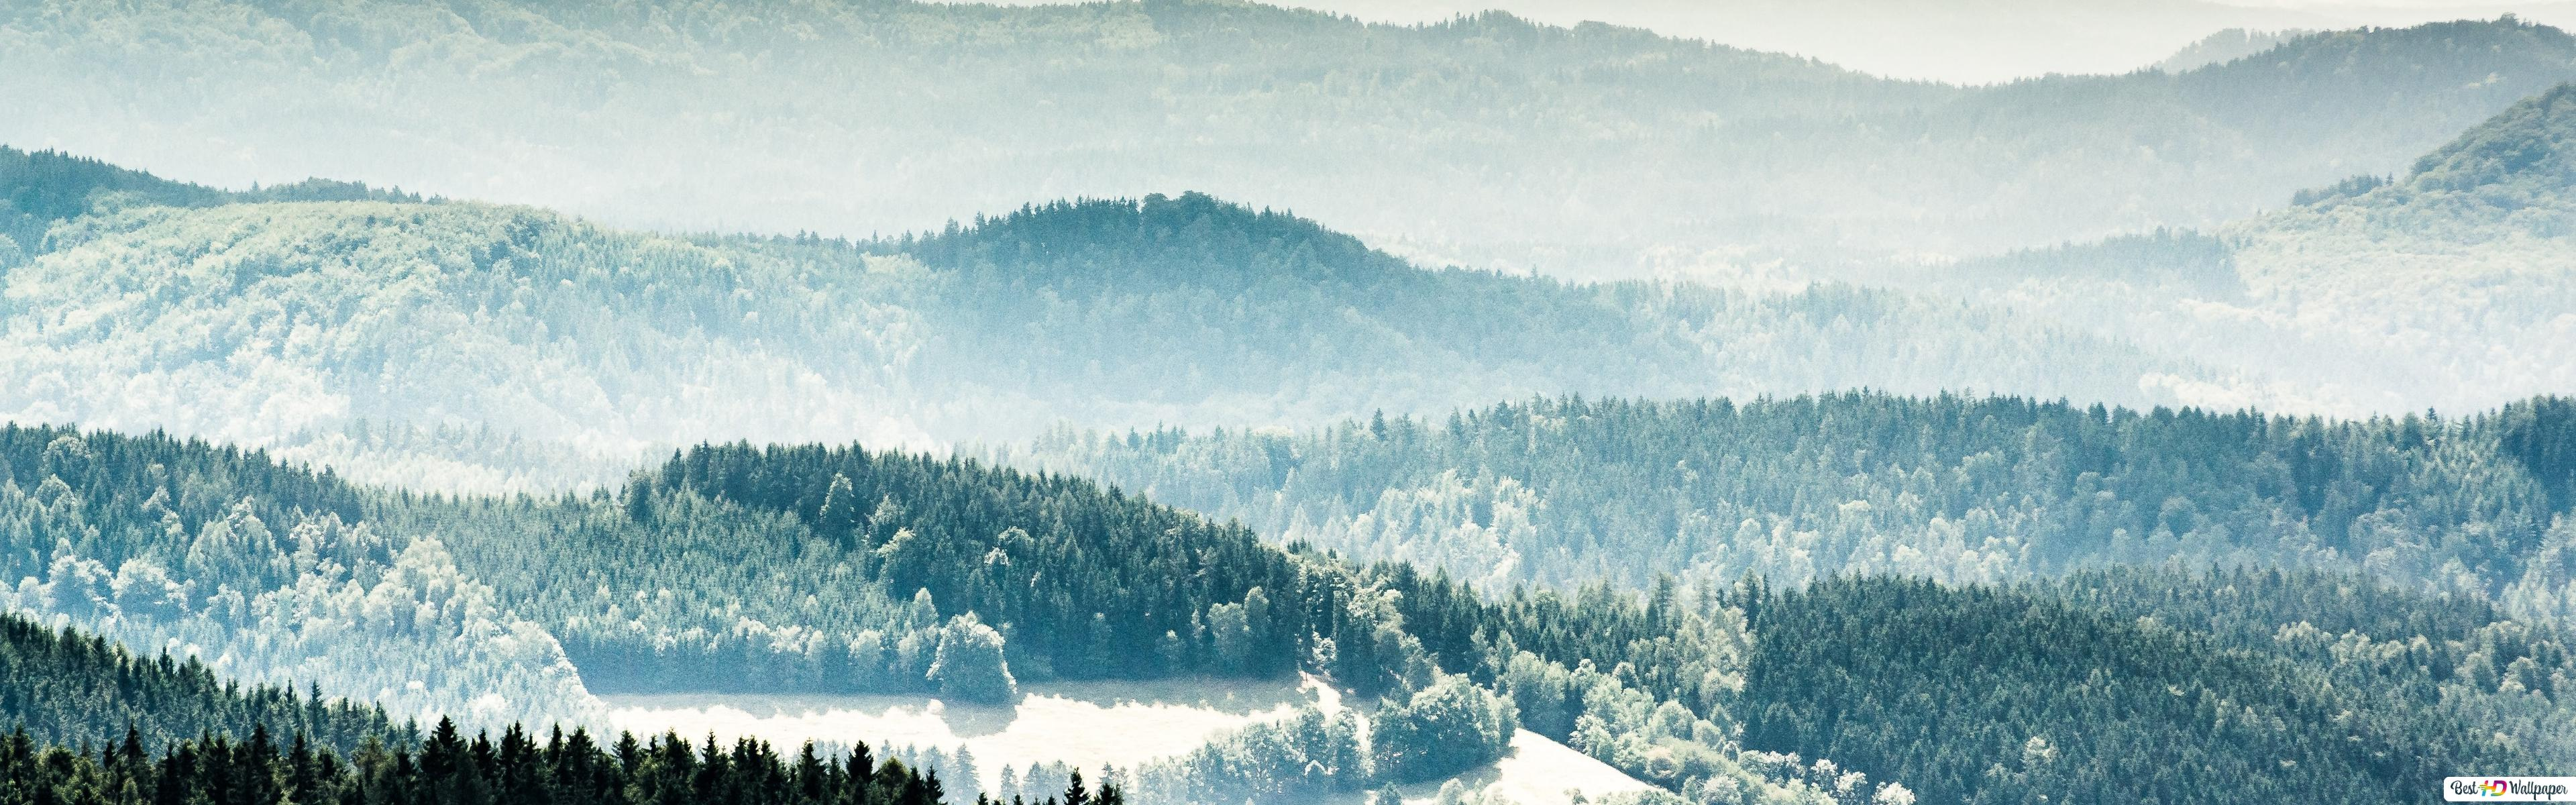 Winter wallpaper 3840x1200